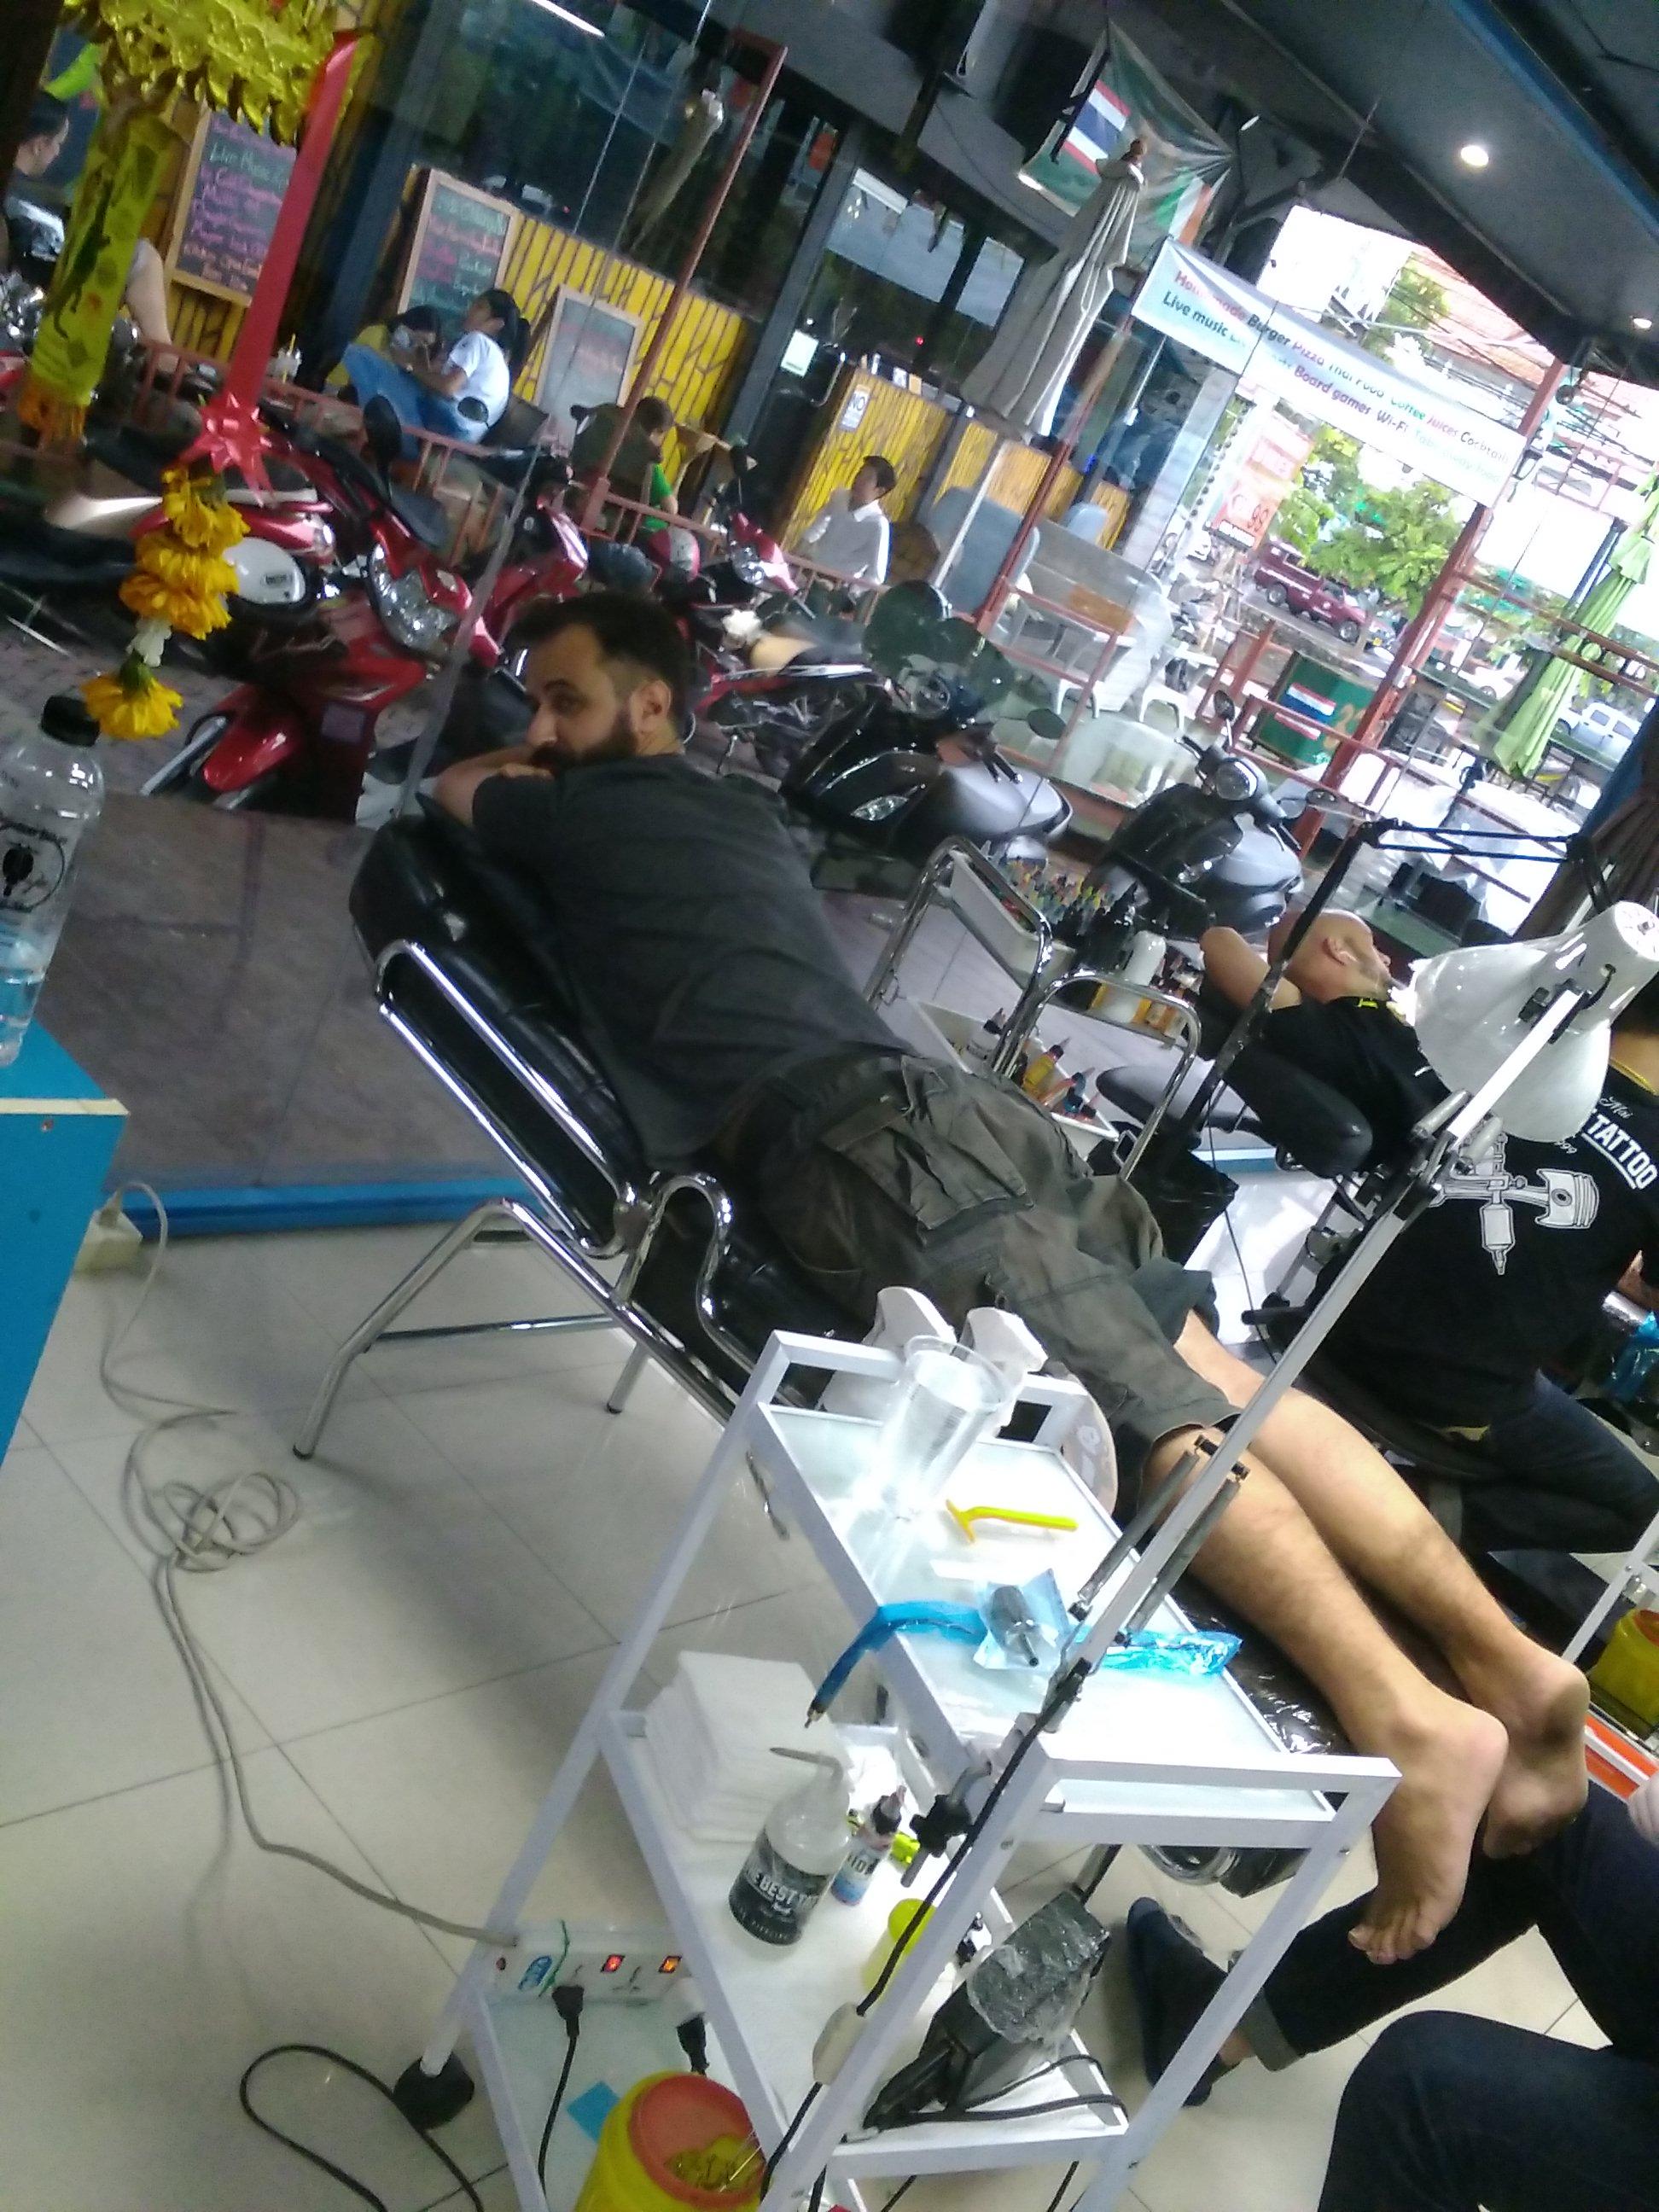 chiang mai tatouage 2019